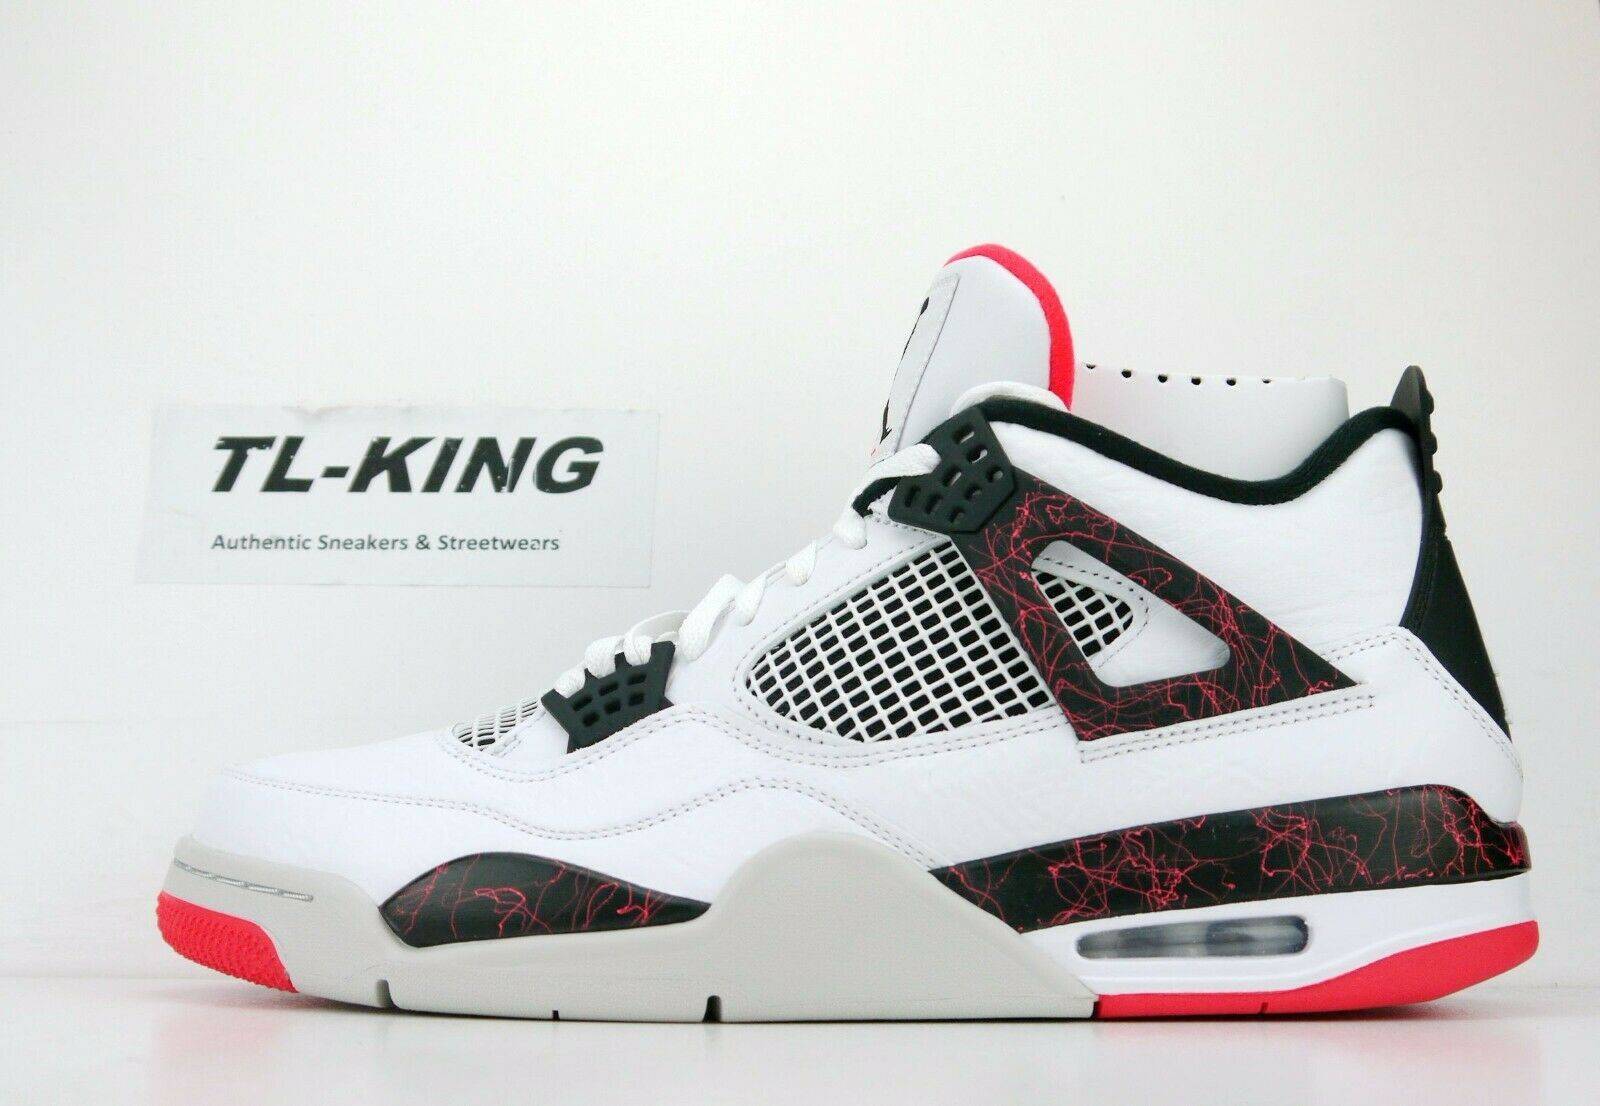 outlet store 19ed0 5ba2b Nike Air Jordan 4 Retro Flight Nostalgia Hot Lava Bright Crimson 308497-116  DT